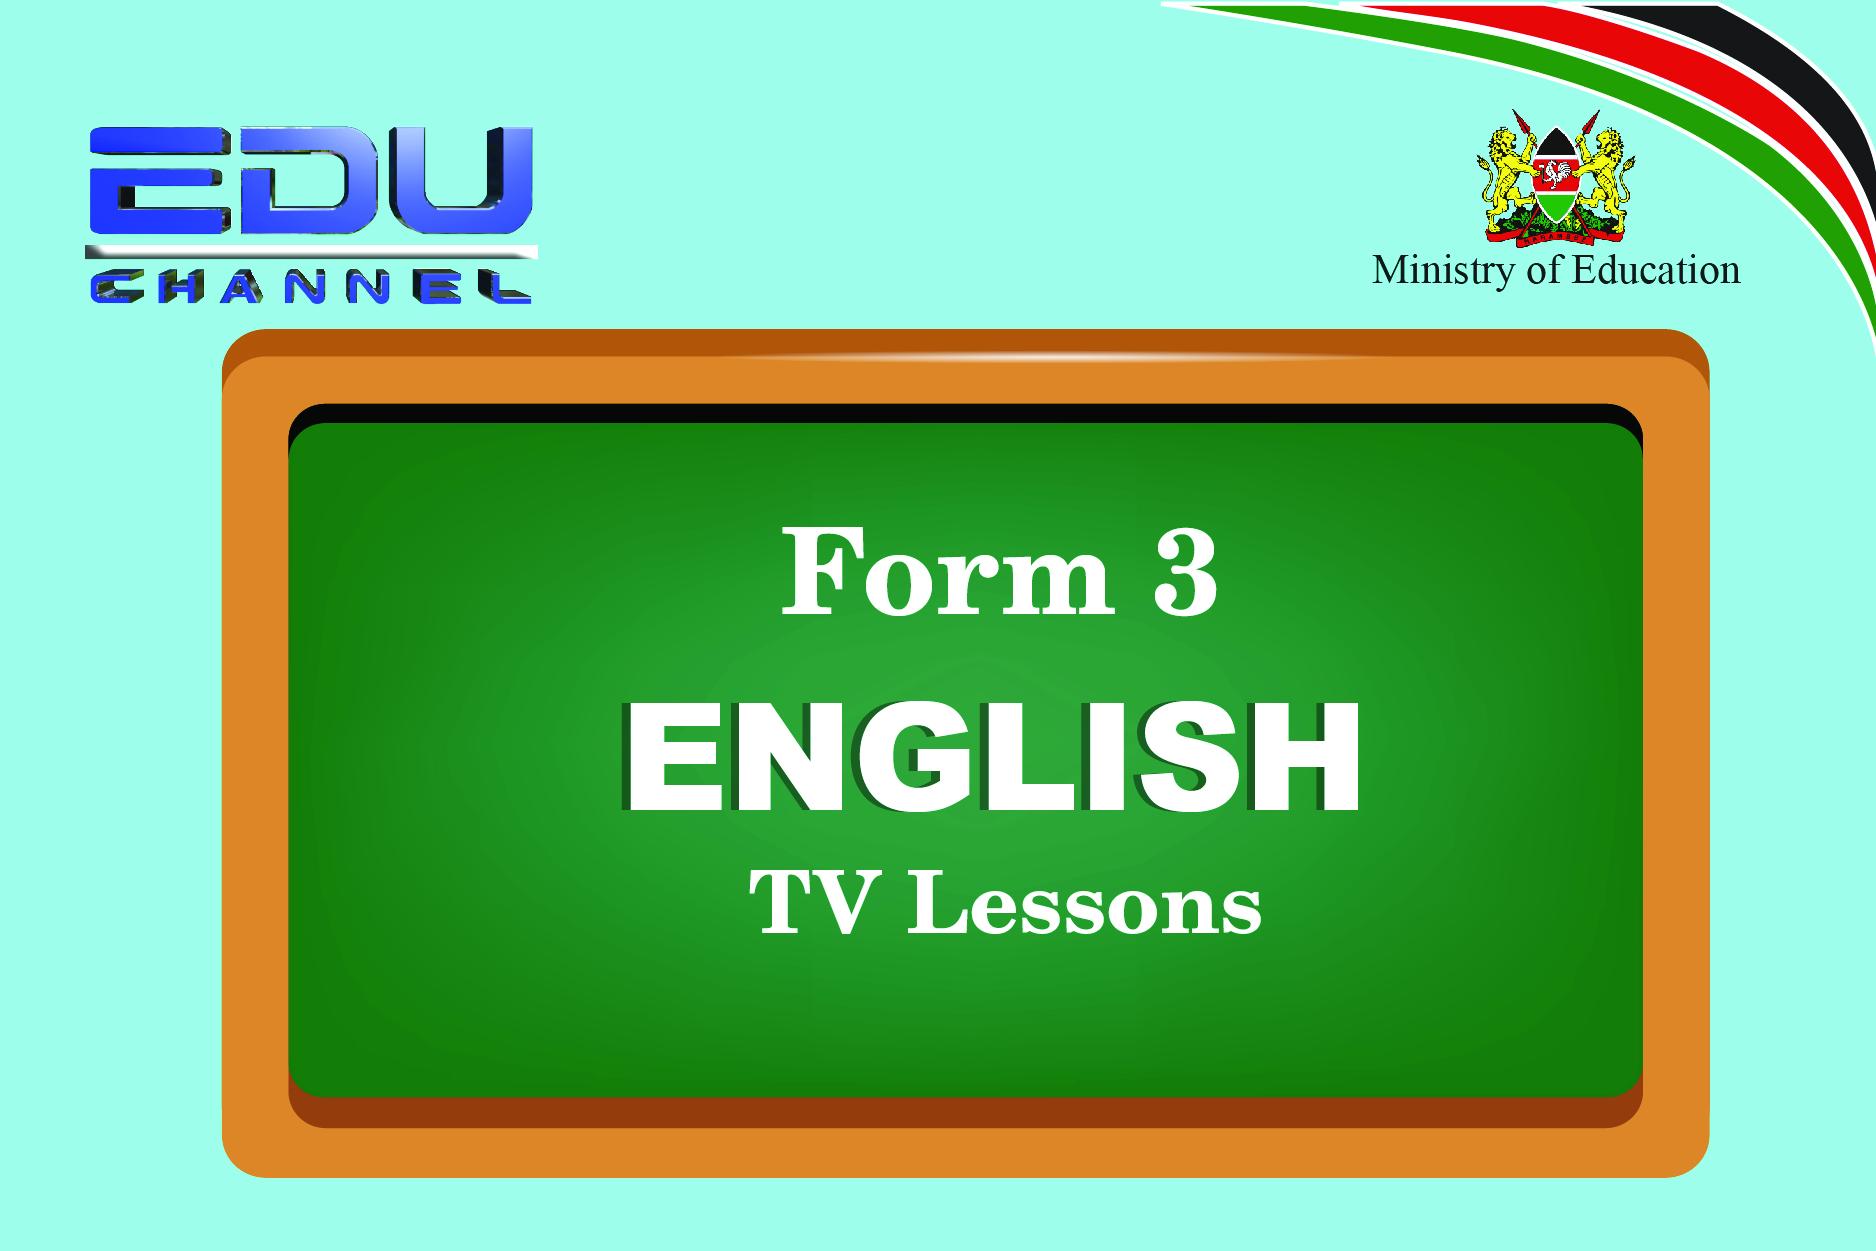 Form 3 English Lesson 2: Oral Skills Stress